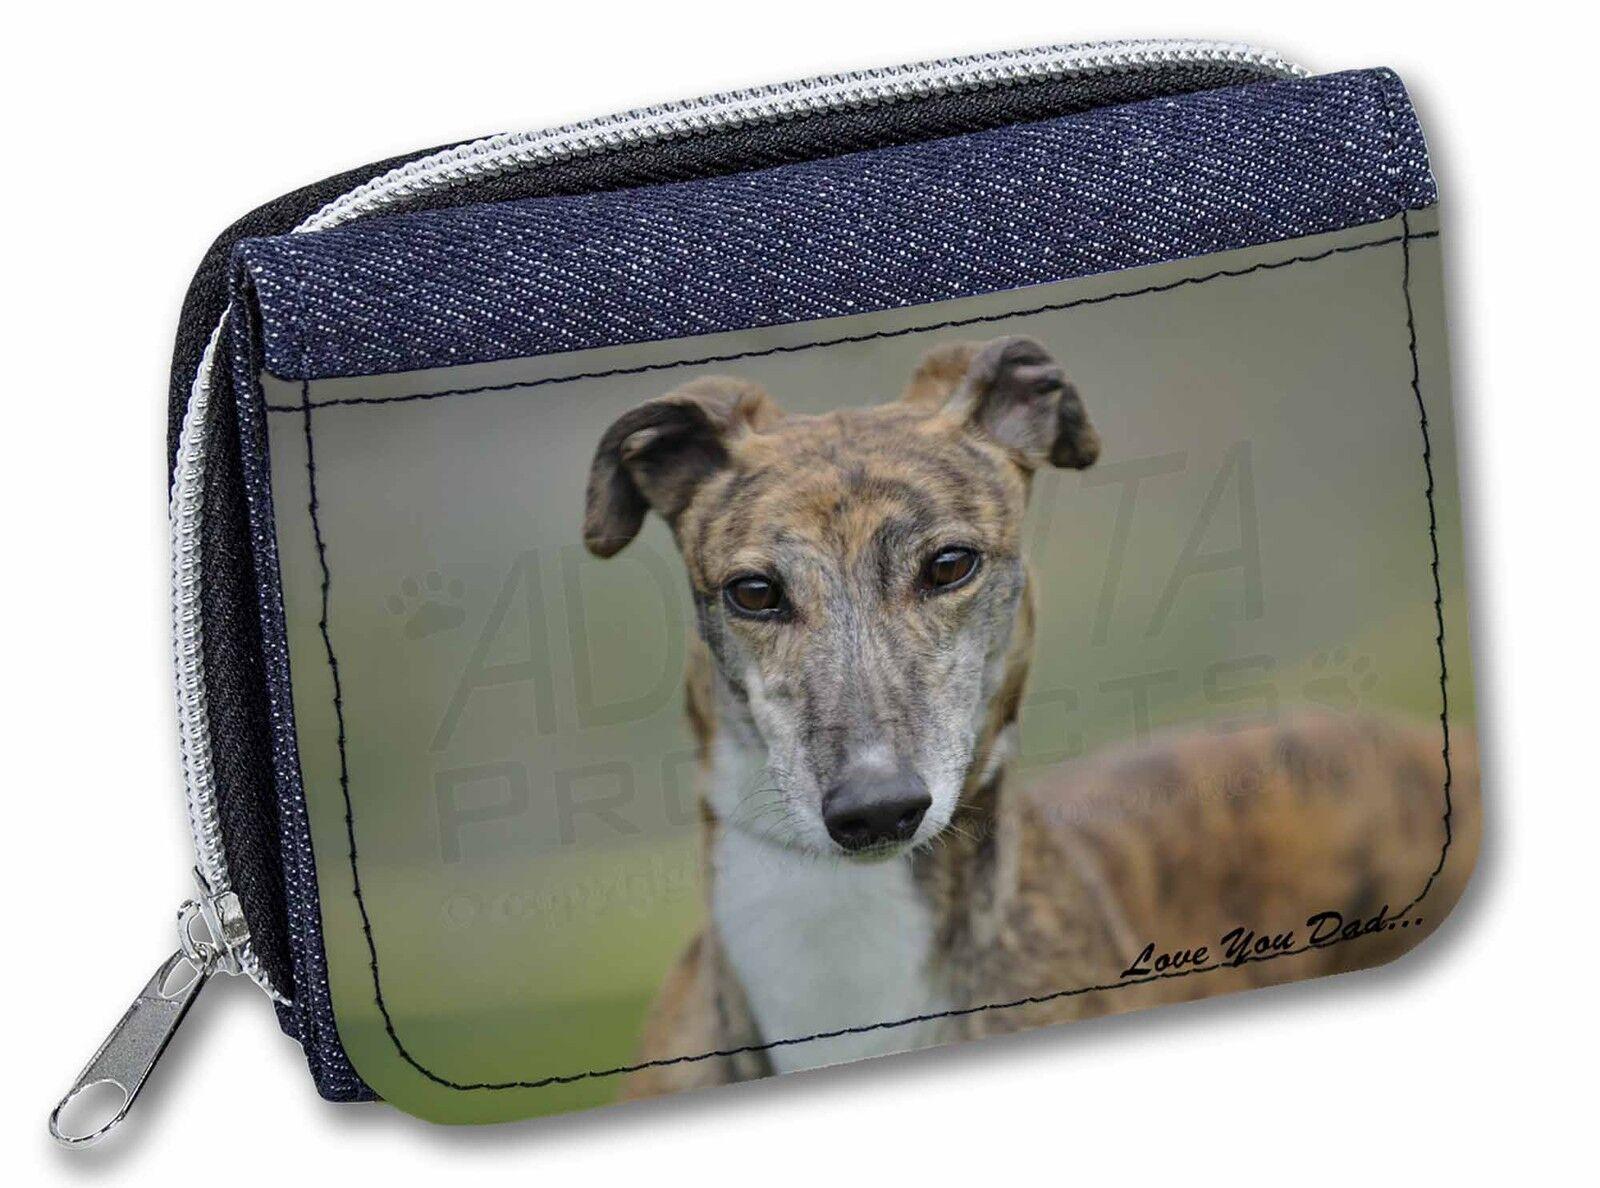 Brindle Greyhound 'Love You Dad' Girls/Ladies Denim Purse Wallet Chri, DAD-173JW